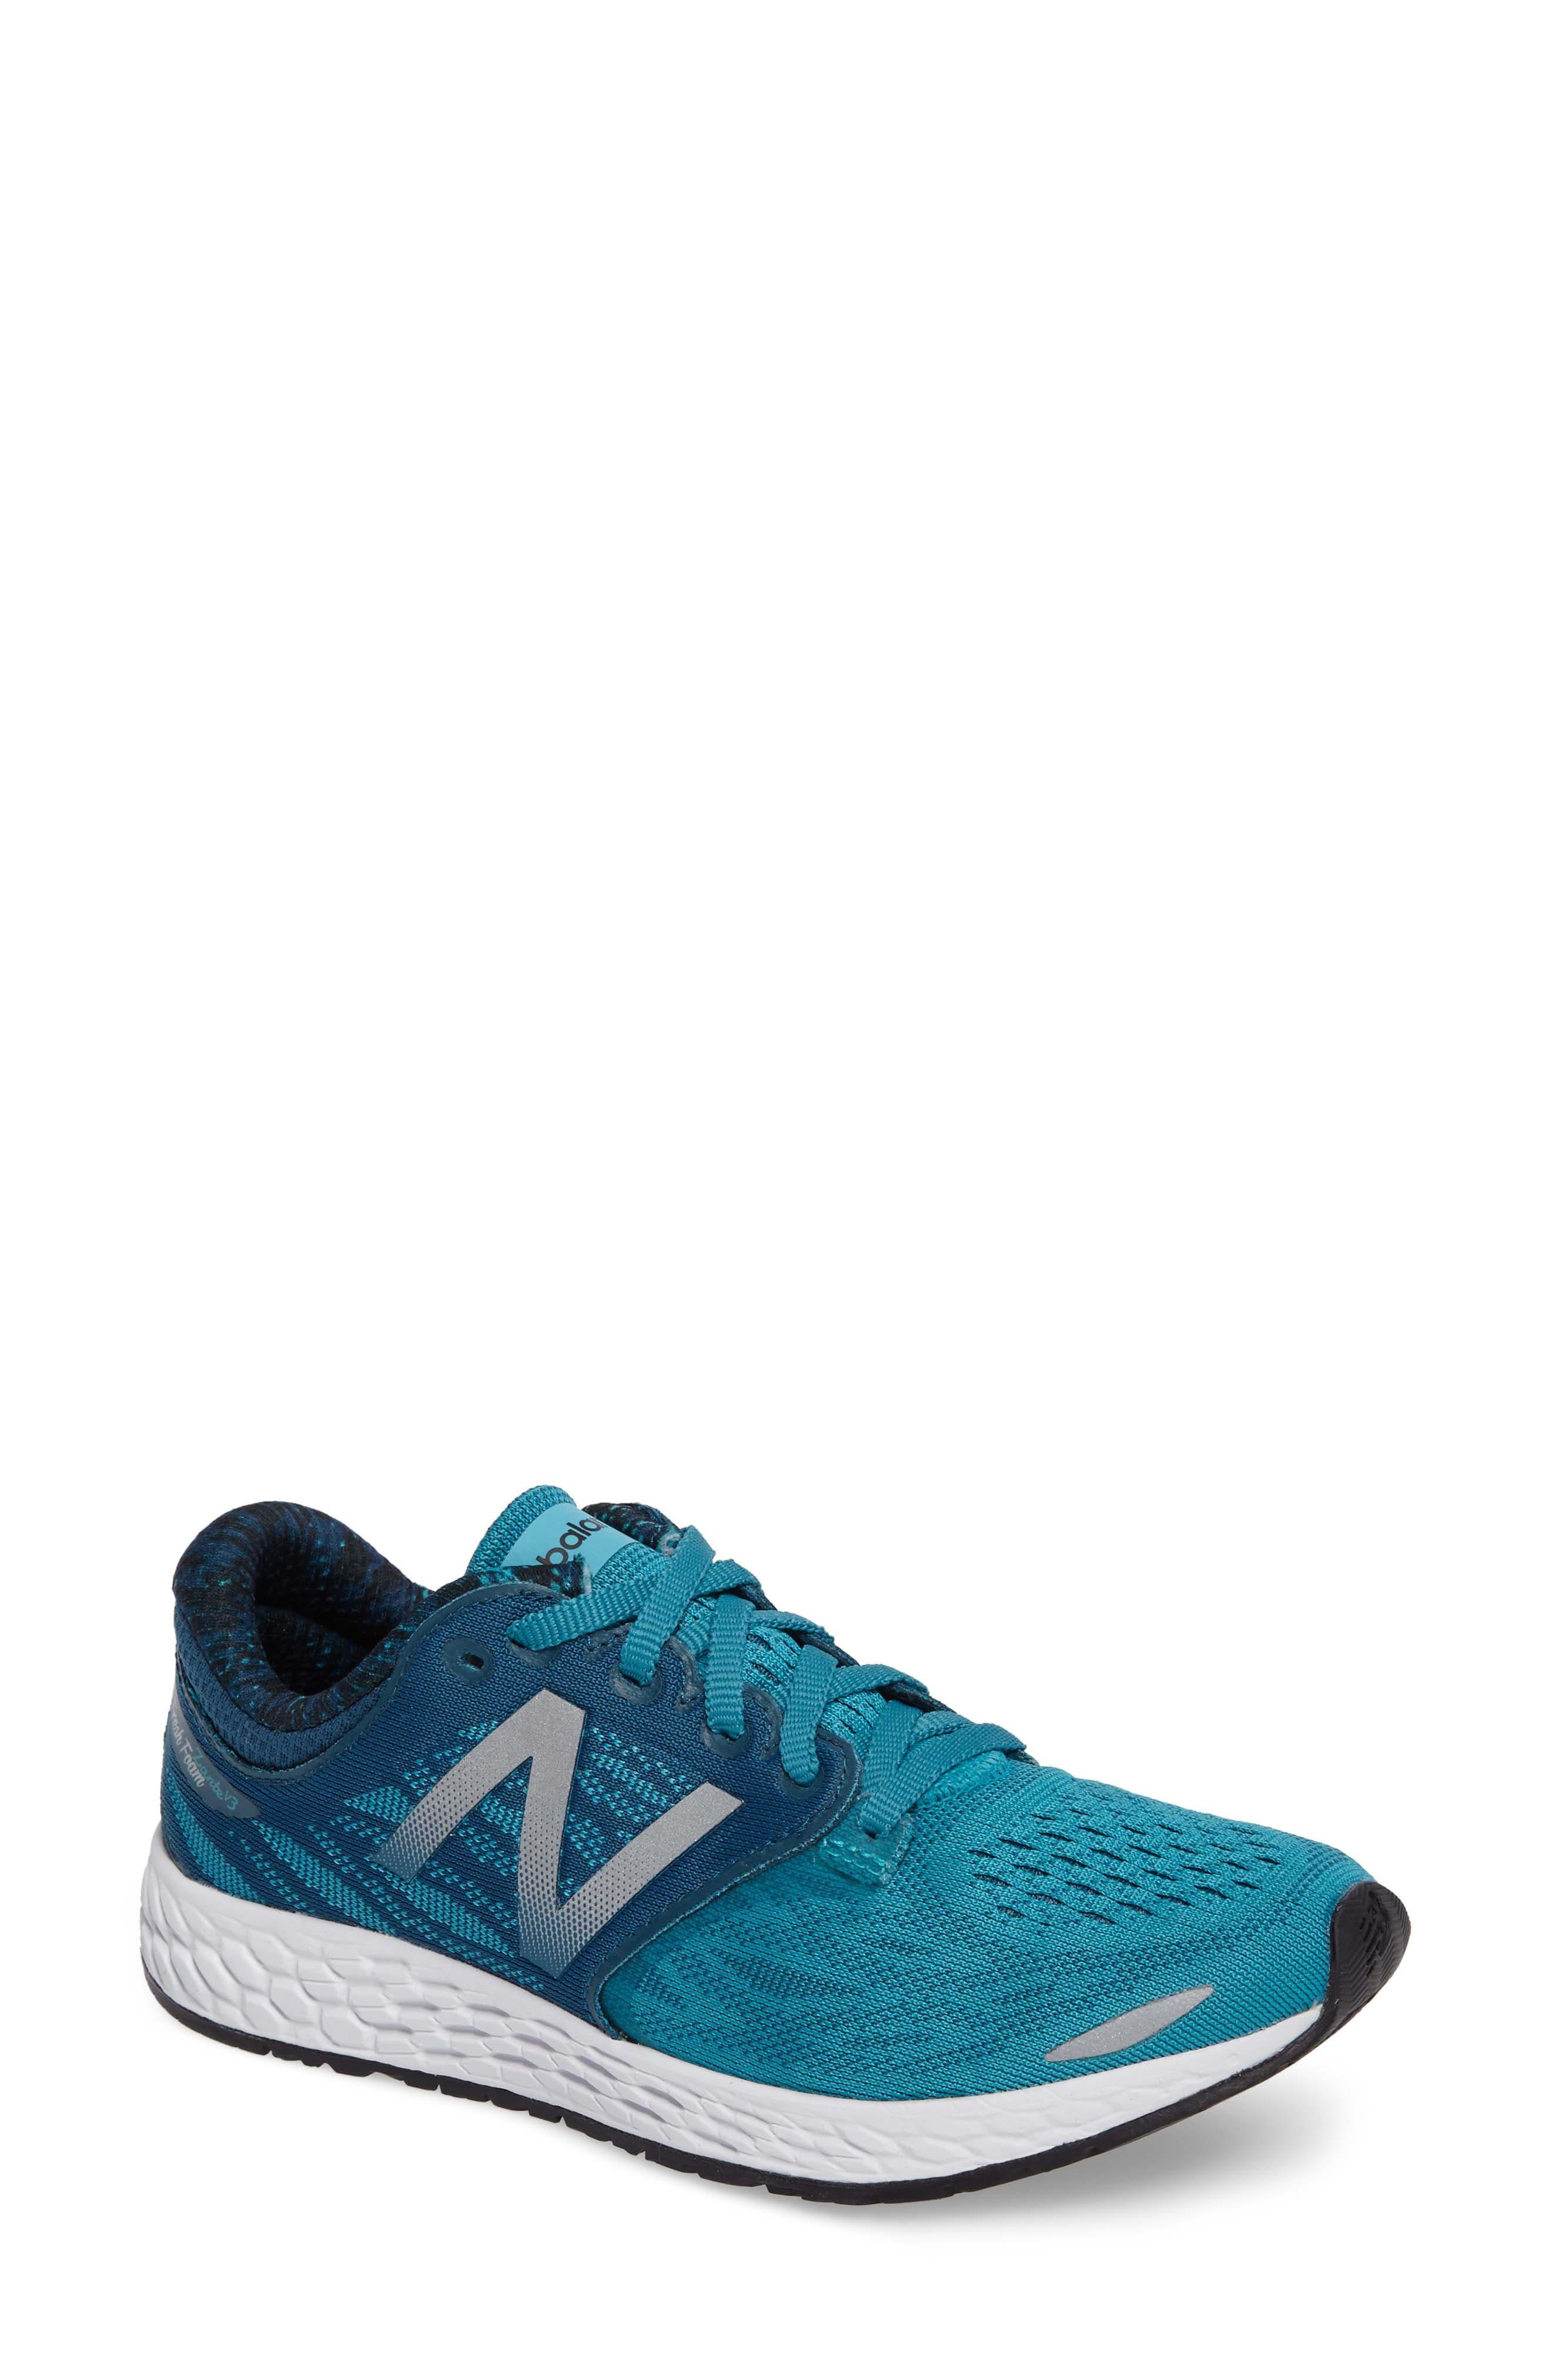 Zante V3 Running Shoe,                             Main thumbnail 1, color,                             Pisces